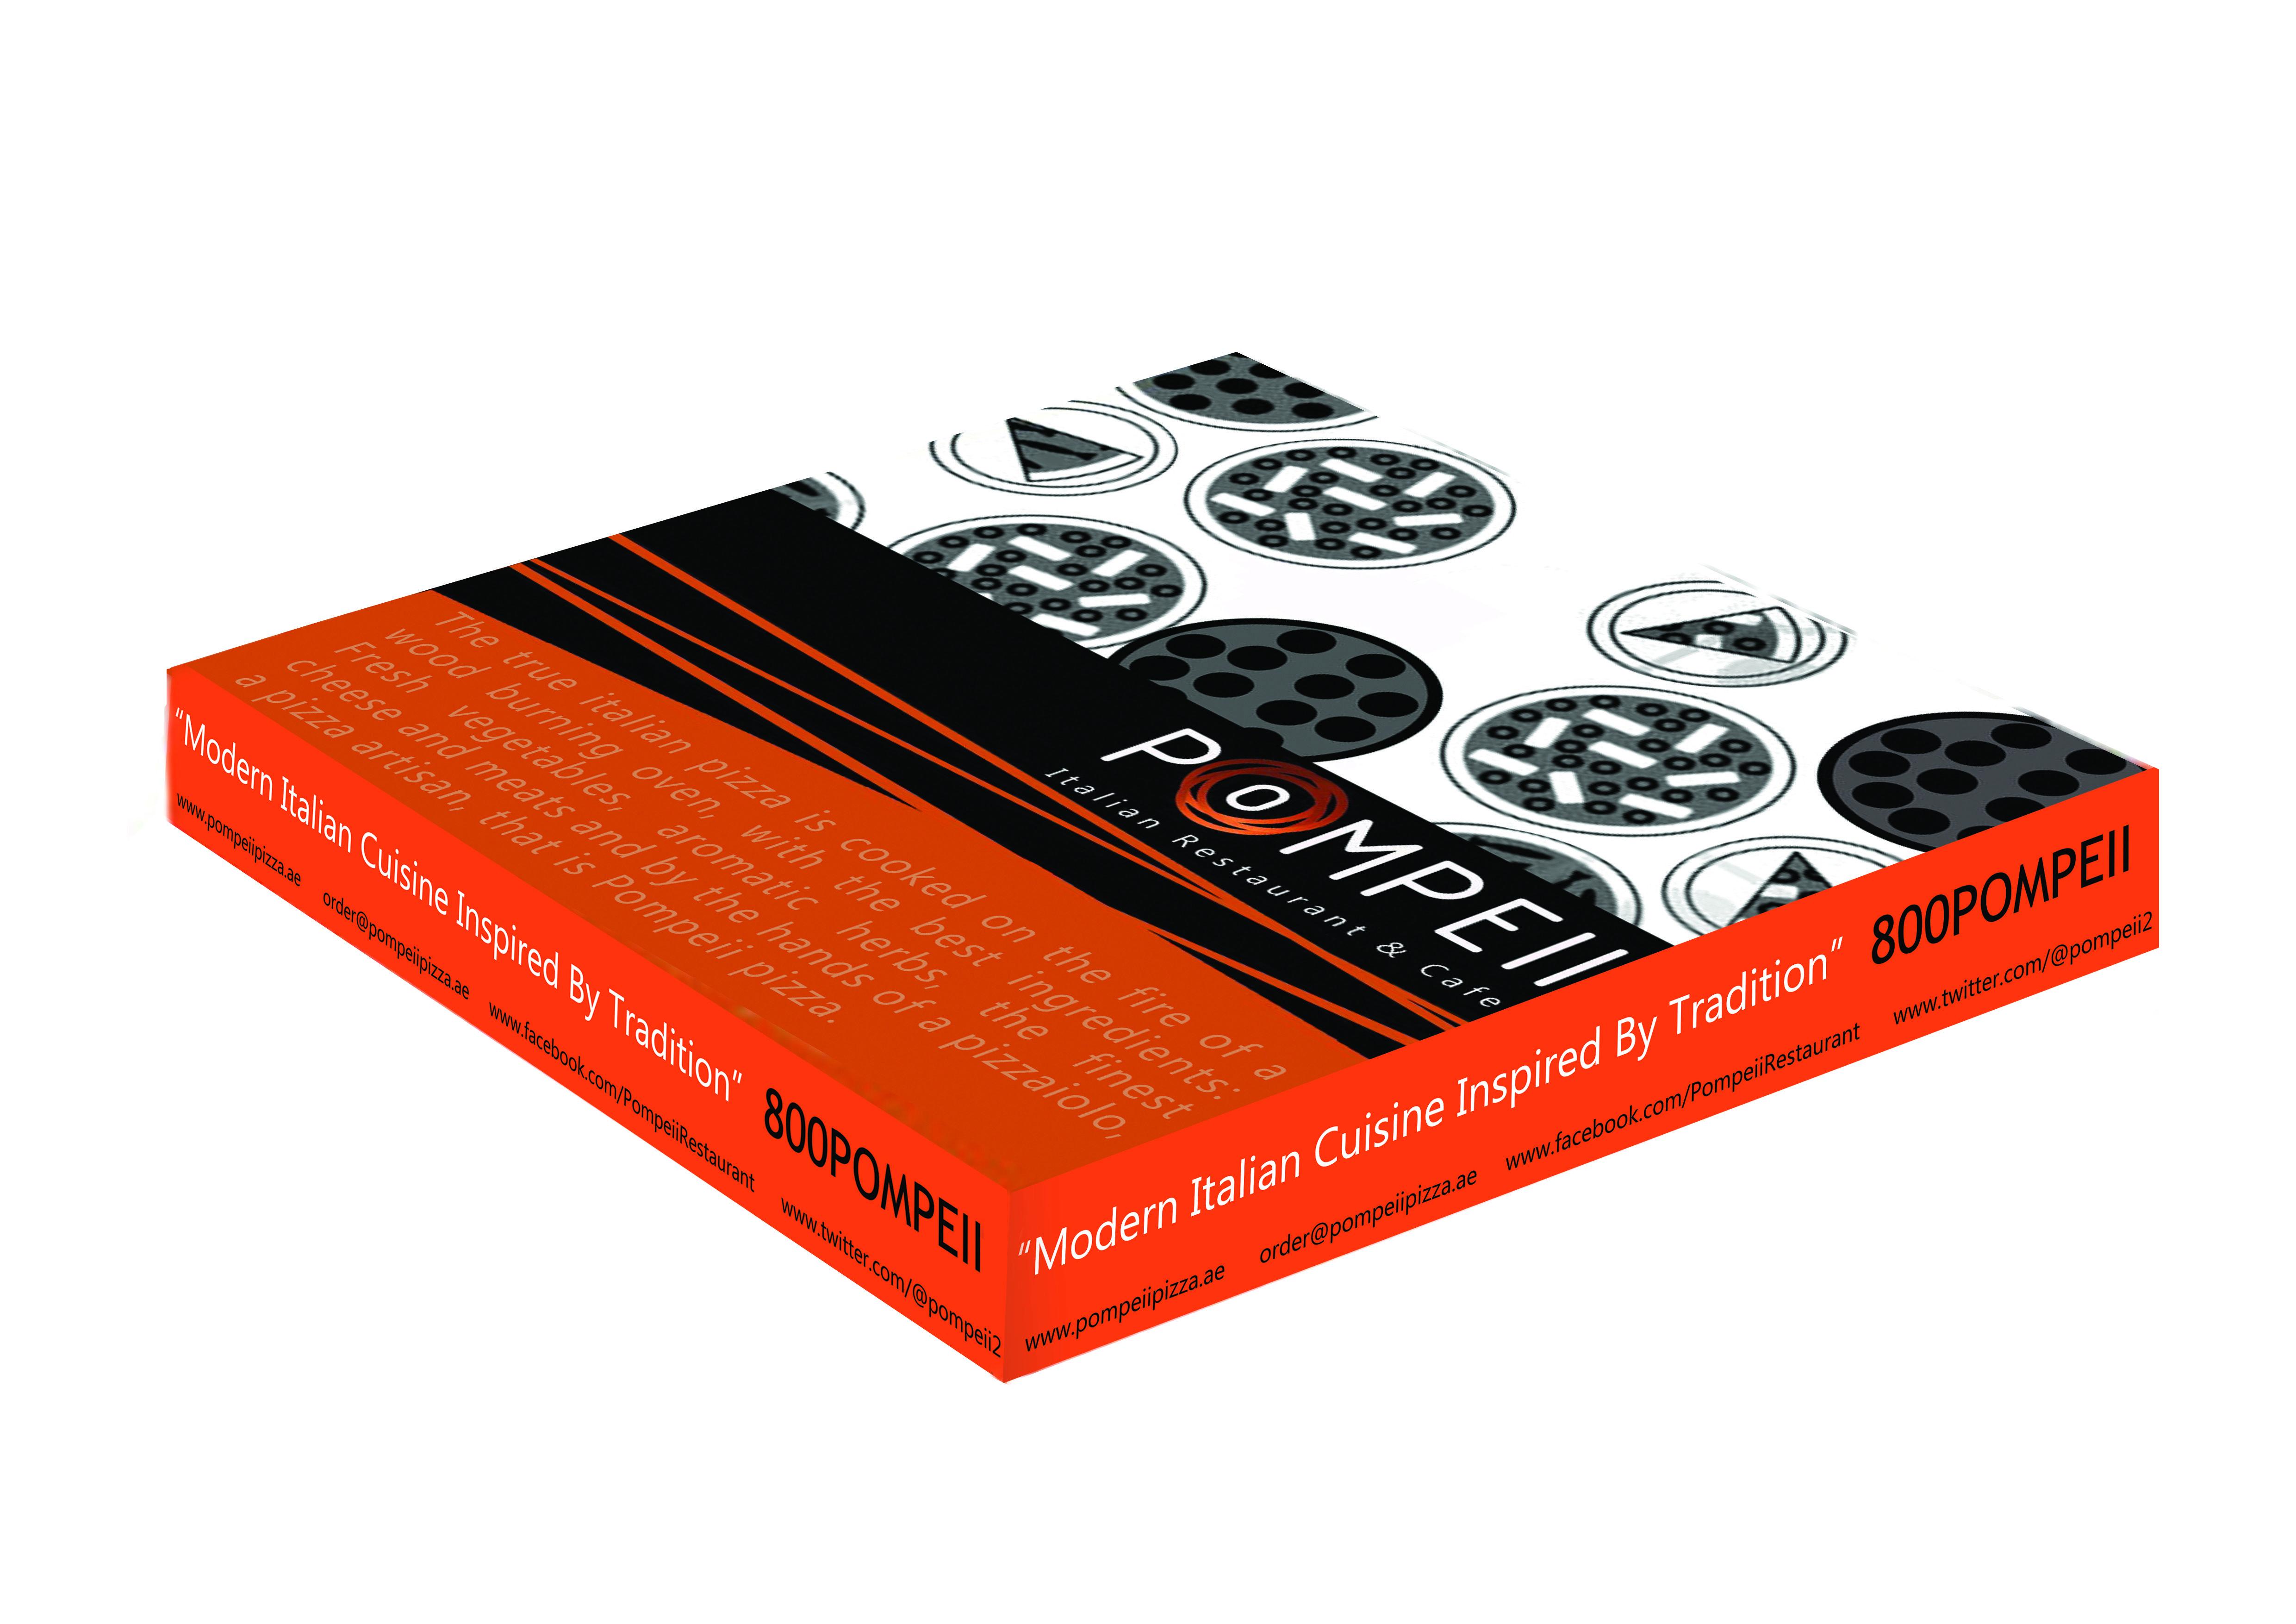 17 Best images about Pizza Box Design on Pinterest | Pizza, Pizza ...